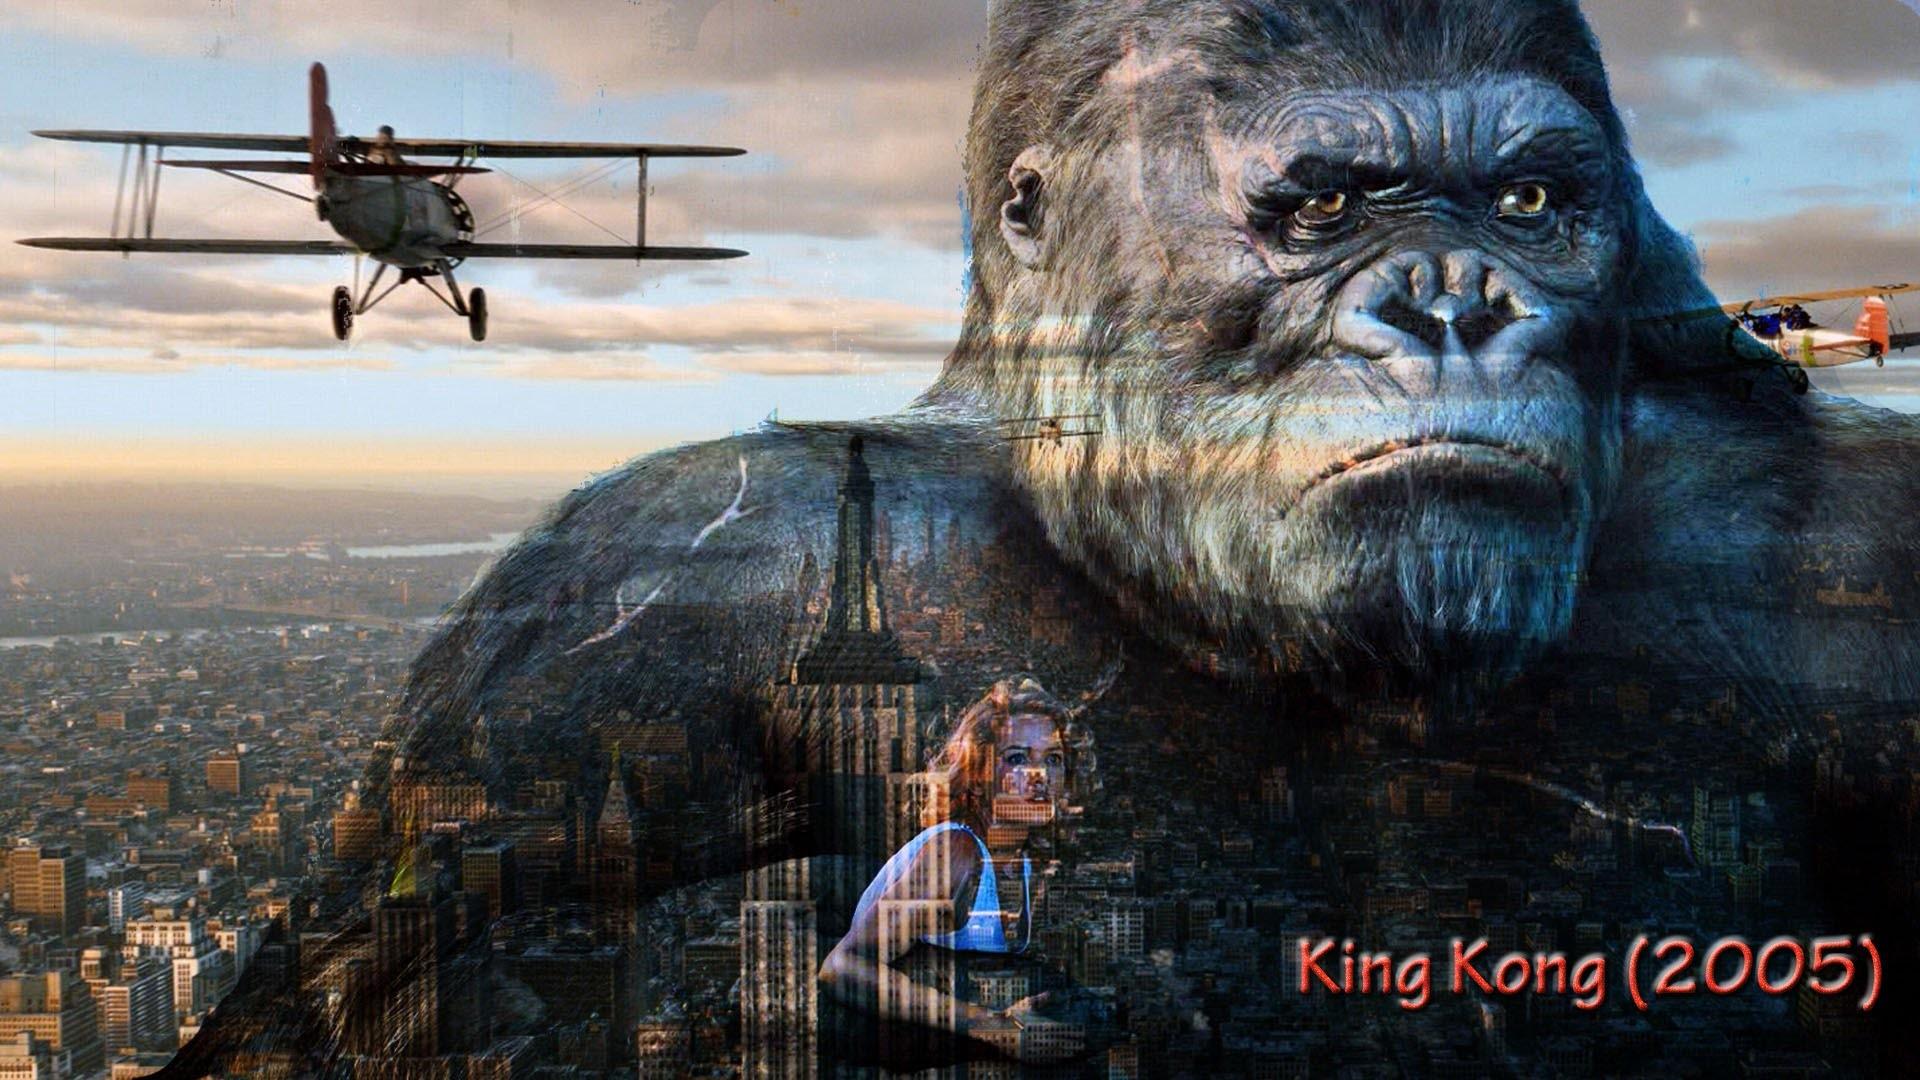 King Kong Wallpaper 67 Images